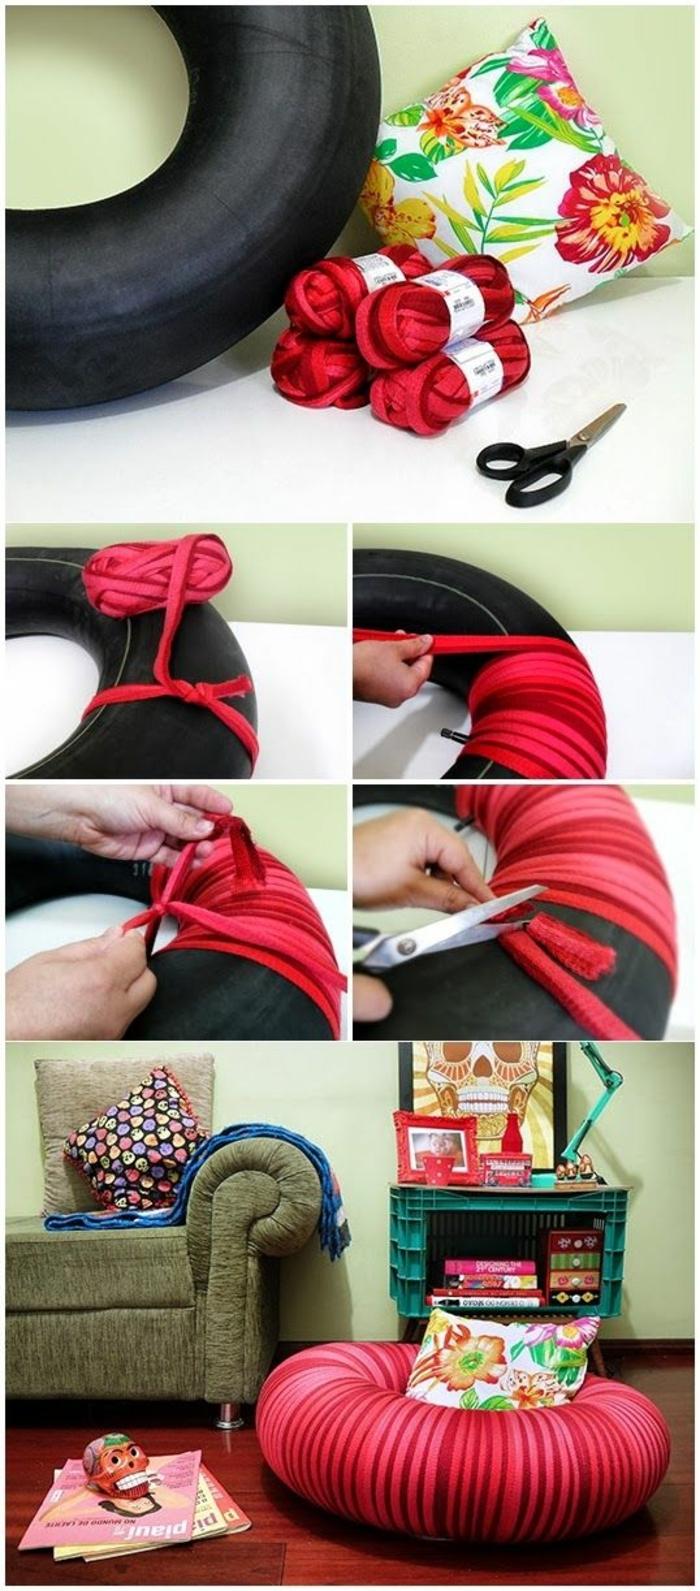 fabriquer un pouf, pneu, tissu à motifs floraux, pelote rouge